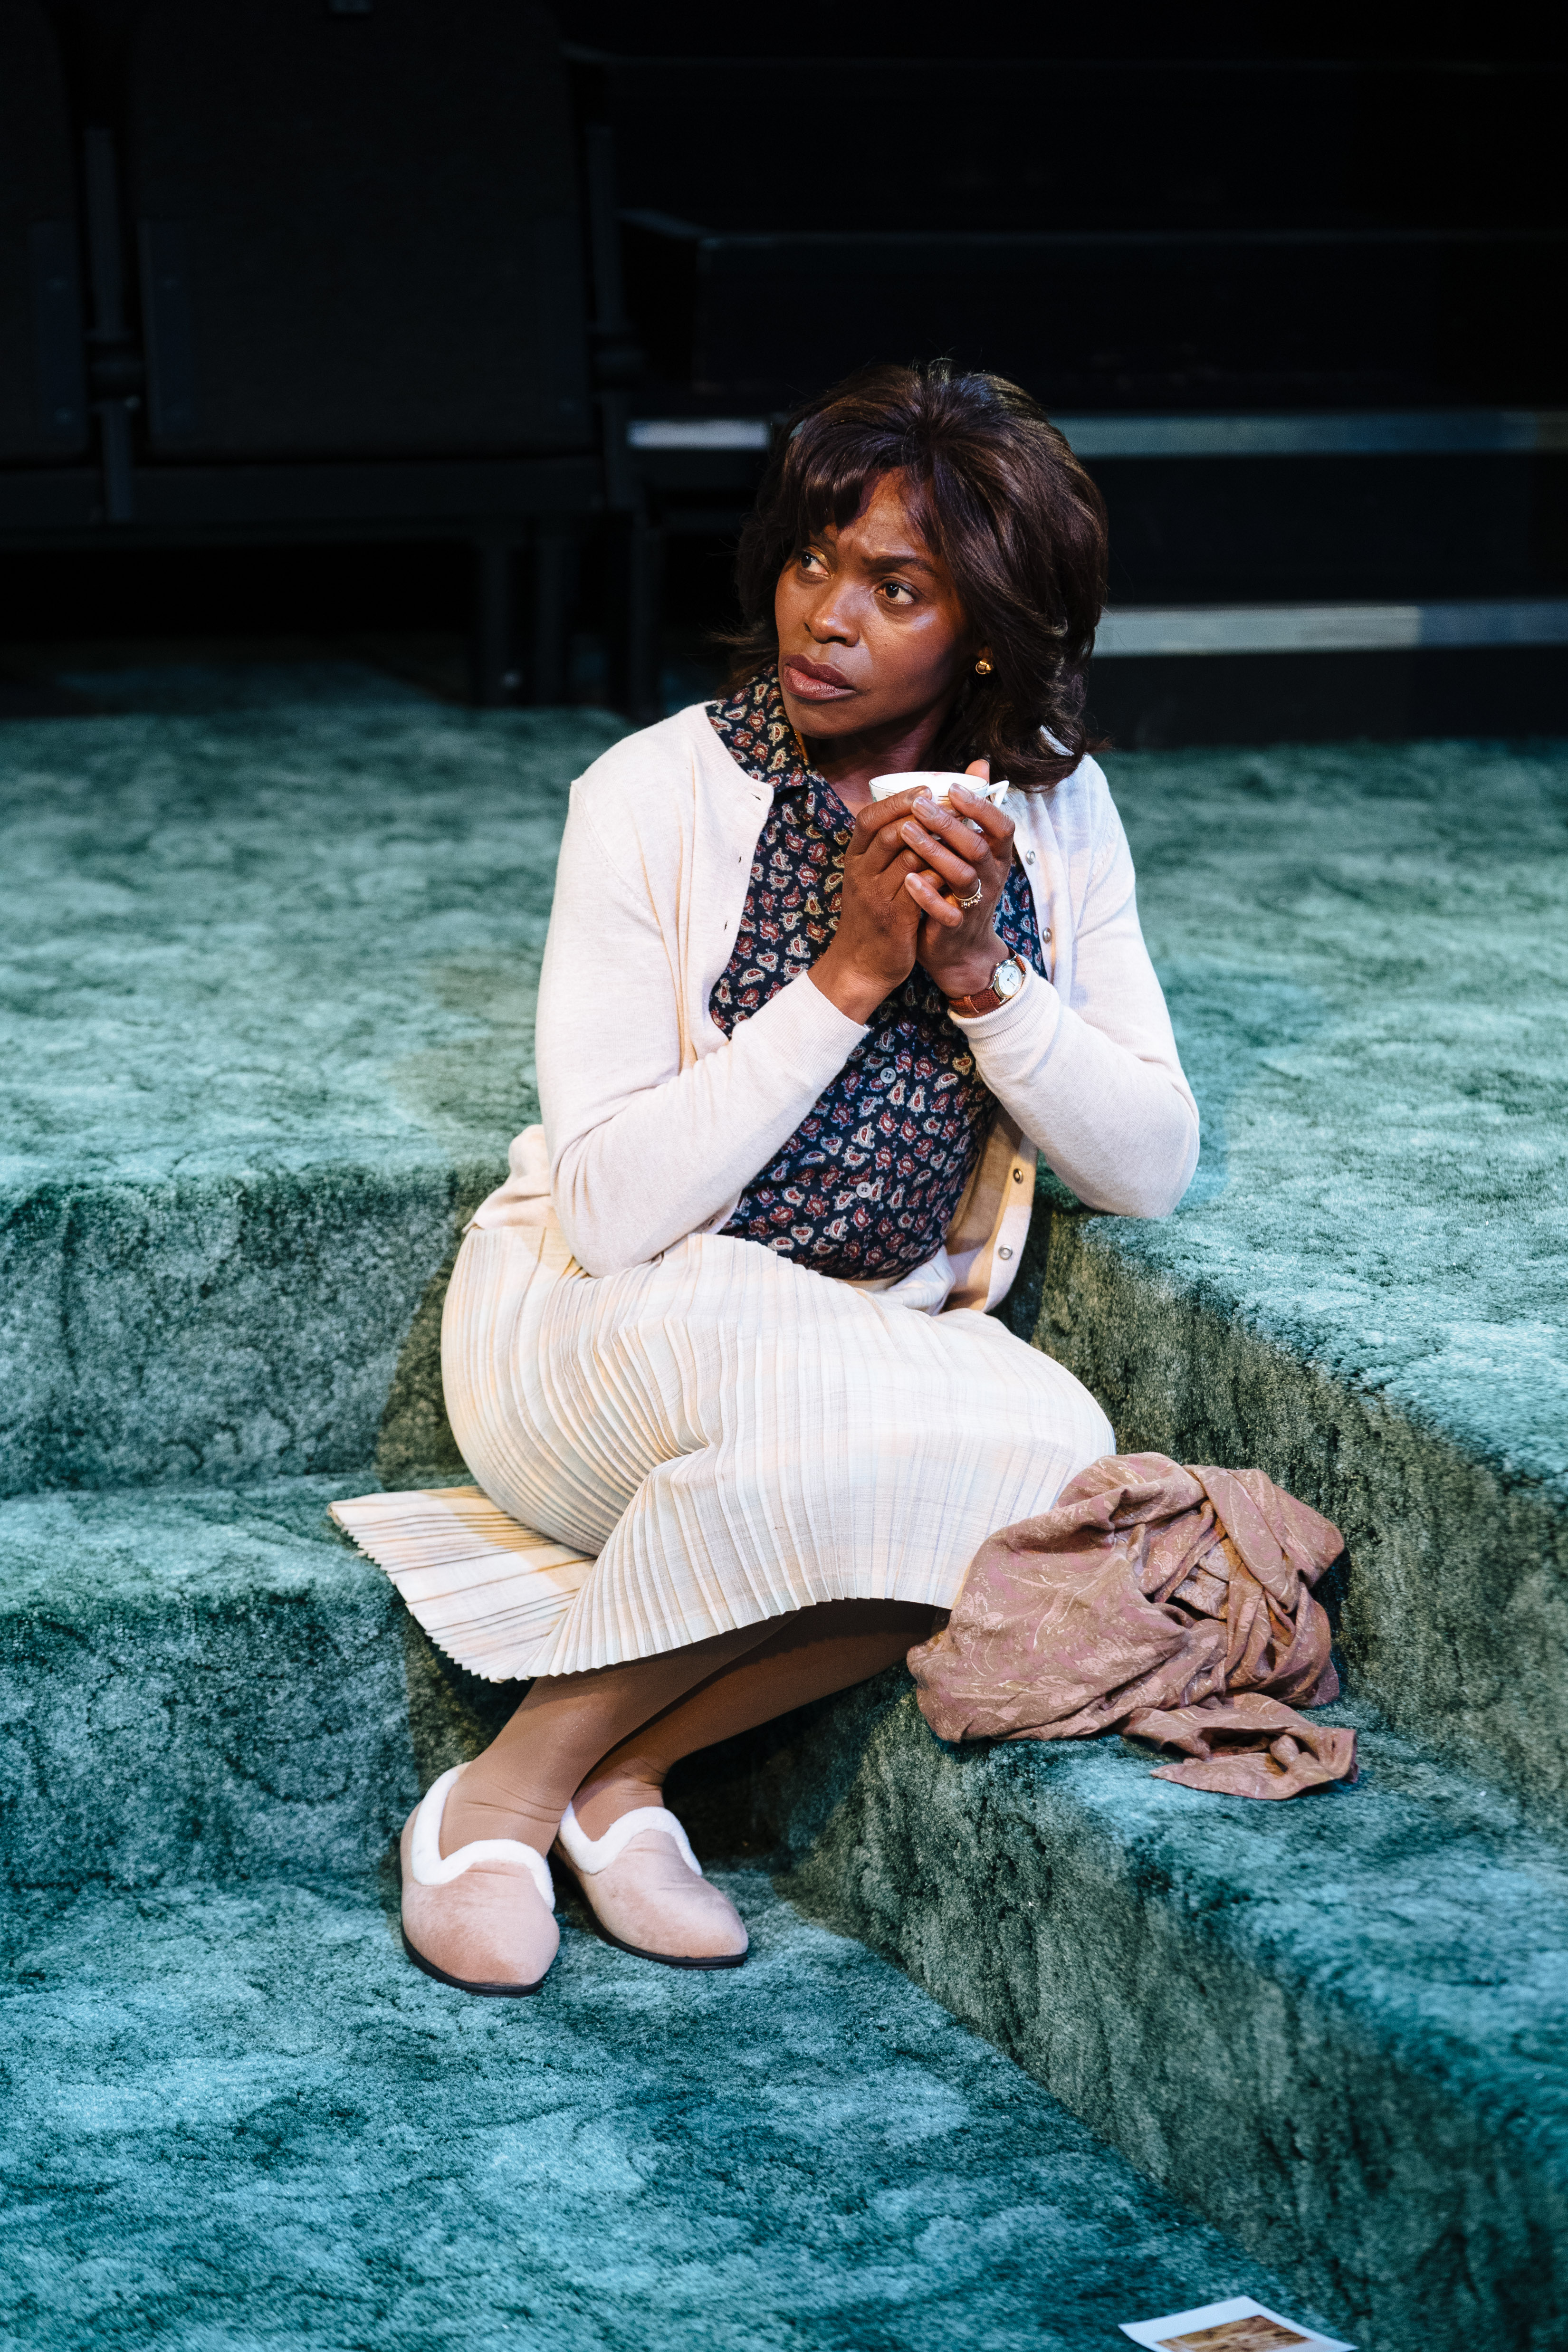 Rakie Ayola as Vivian in 'Strange Fruit' at the Bush Theatre. Photo credit Helen Murray.